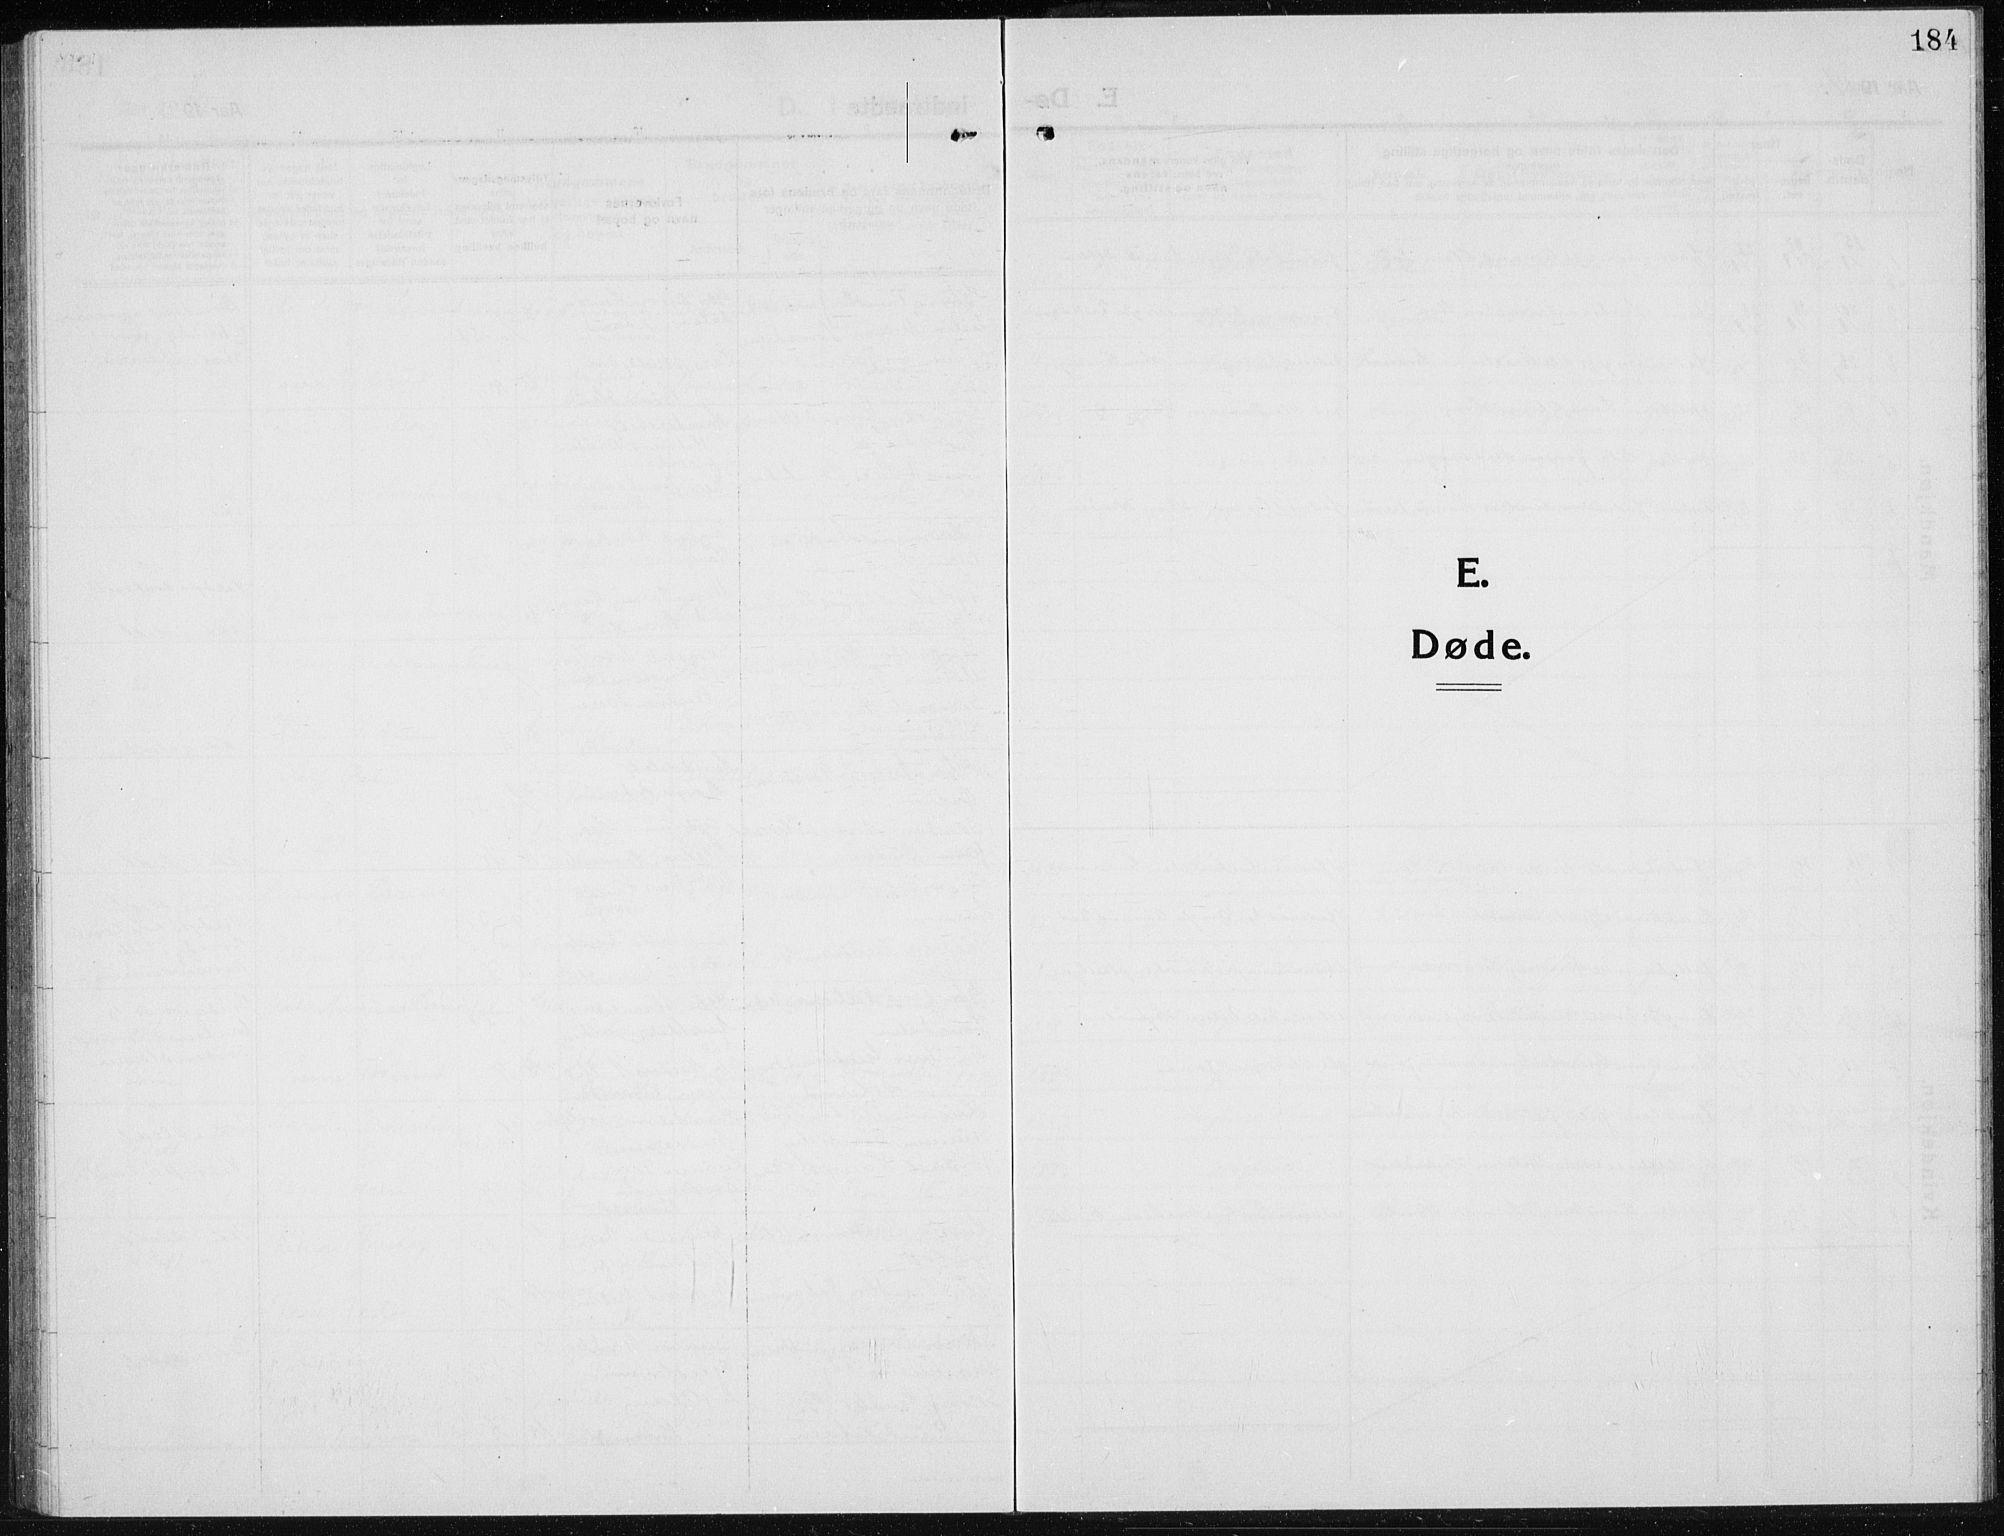 SAH, Brandbu prestekontor, Klokkerbok nr. 1, 1914-1937, s. 184